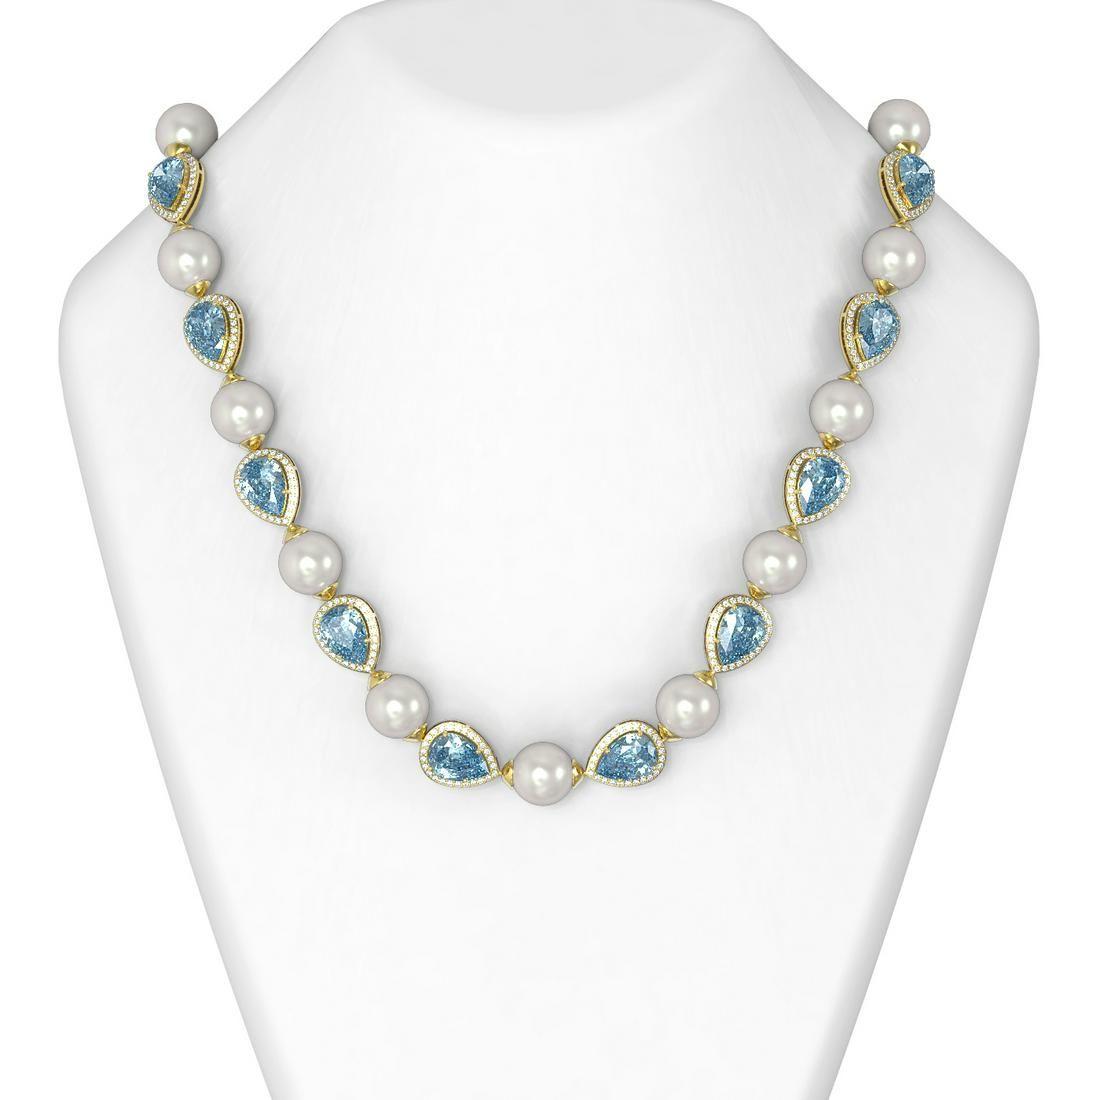 39.65 ctw Blue Topaz & Diamond Necklace 18K Yellow Gold